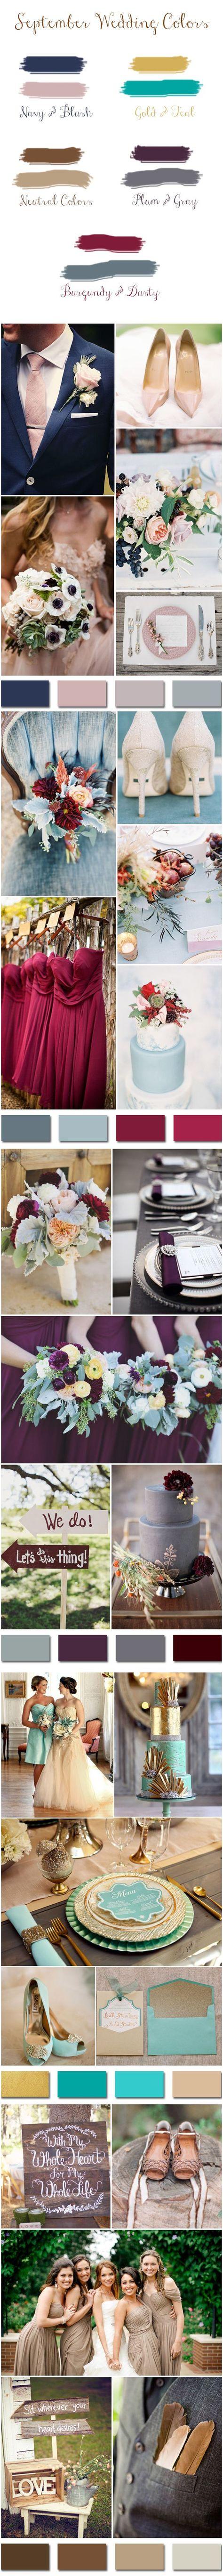 top 5 fall wedding colors for september brides prison september